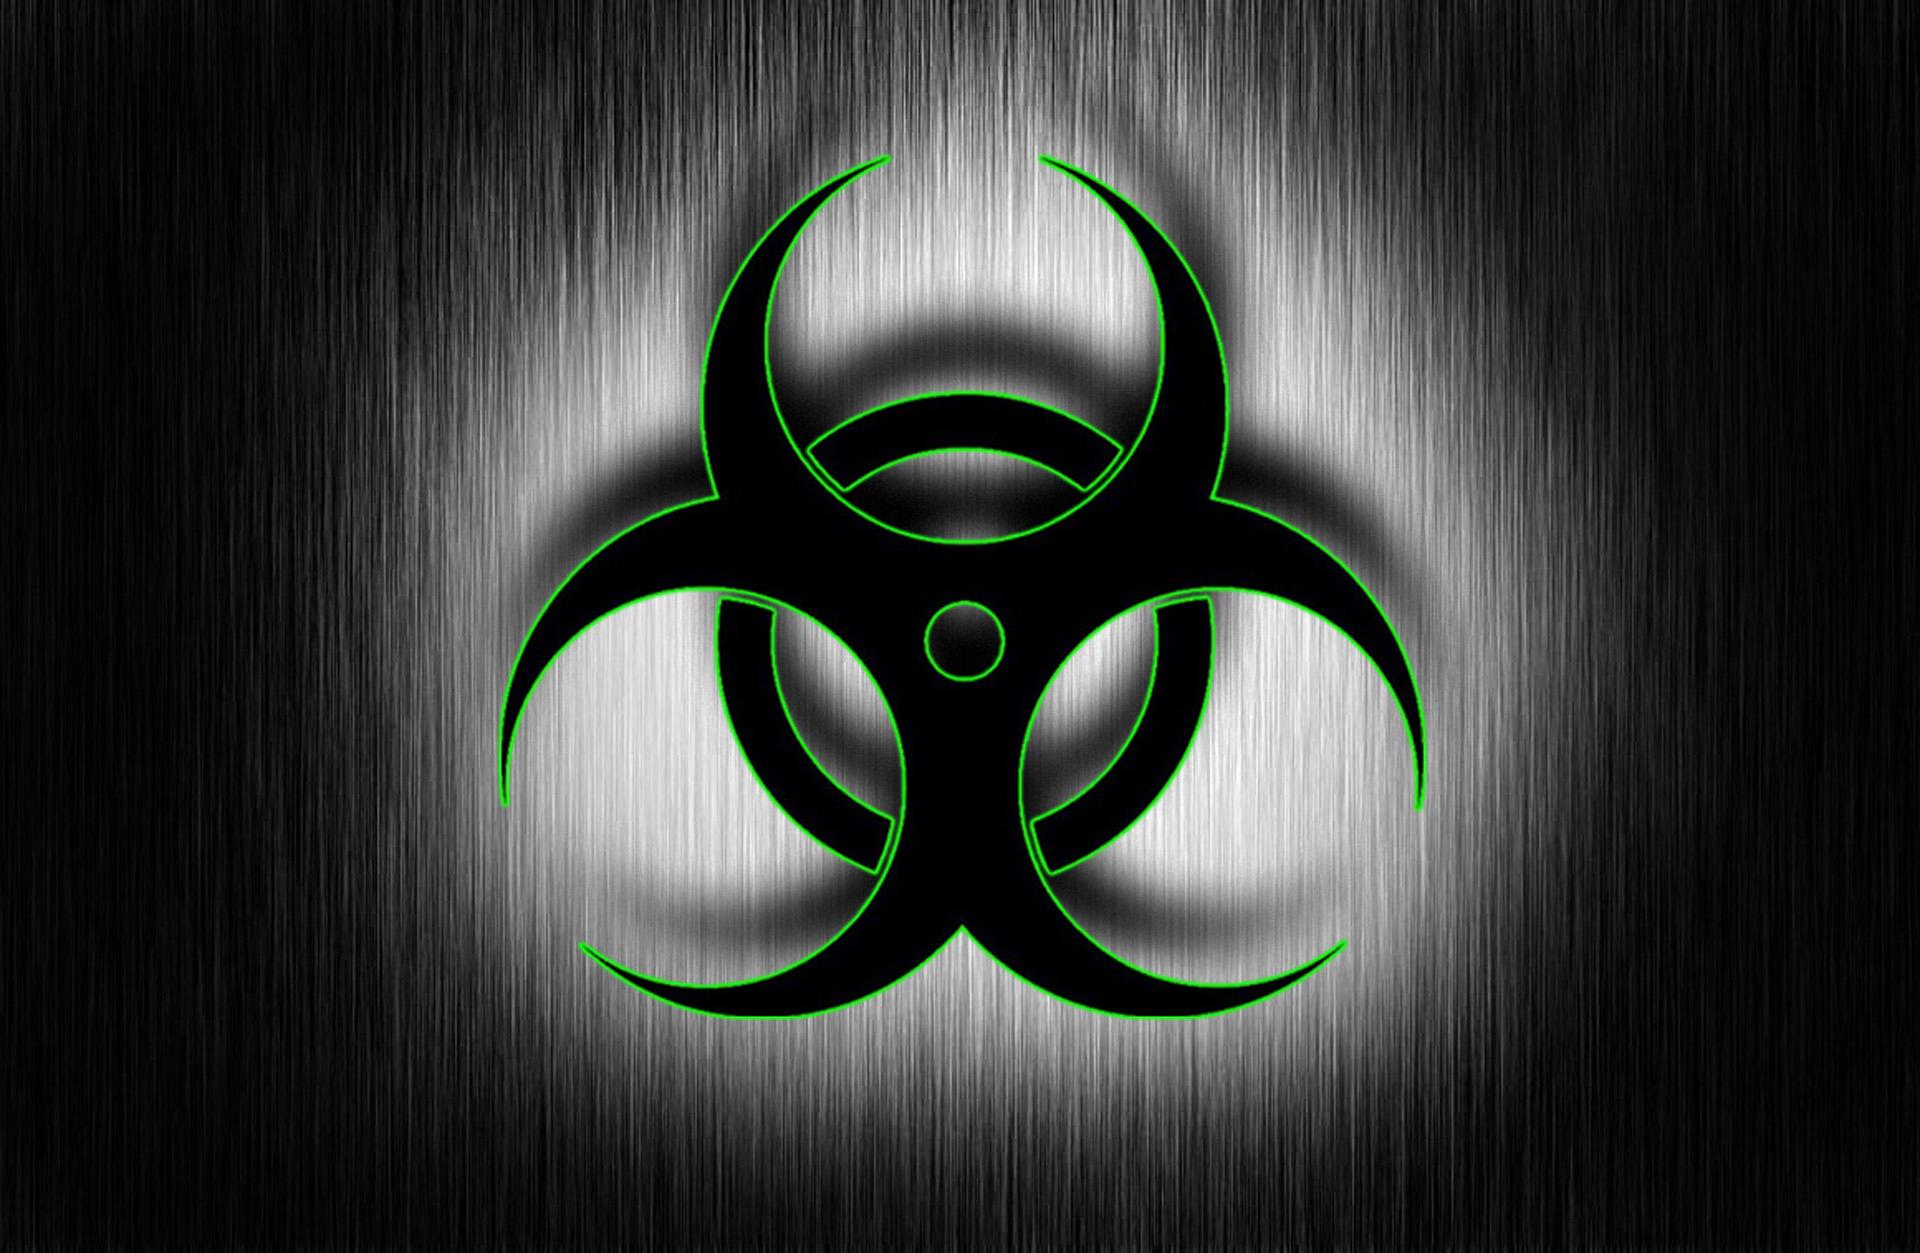 Biohazard Green by Azula-Bluefire on DeviantArt